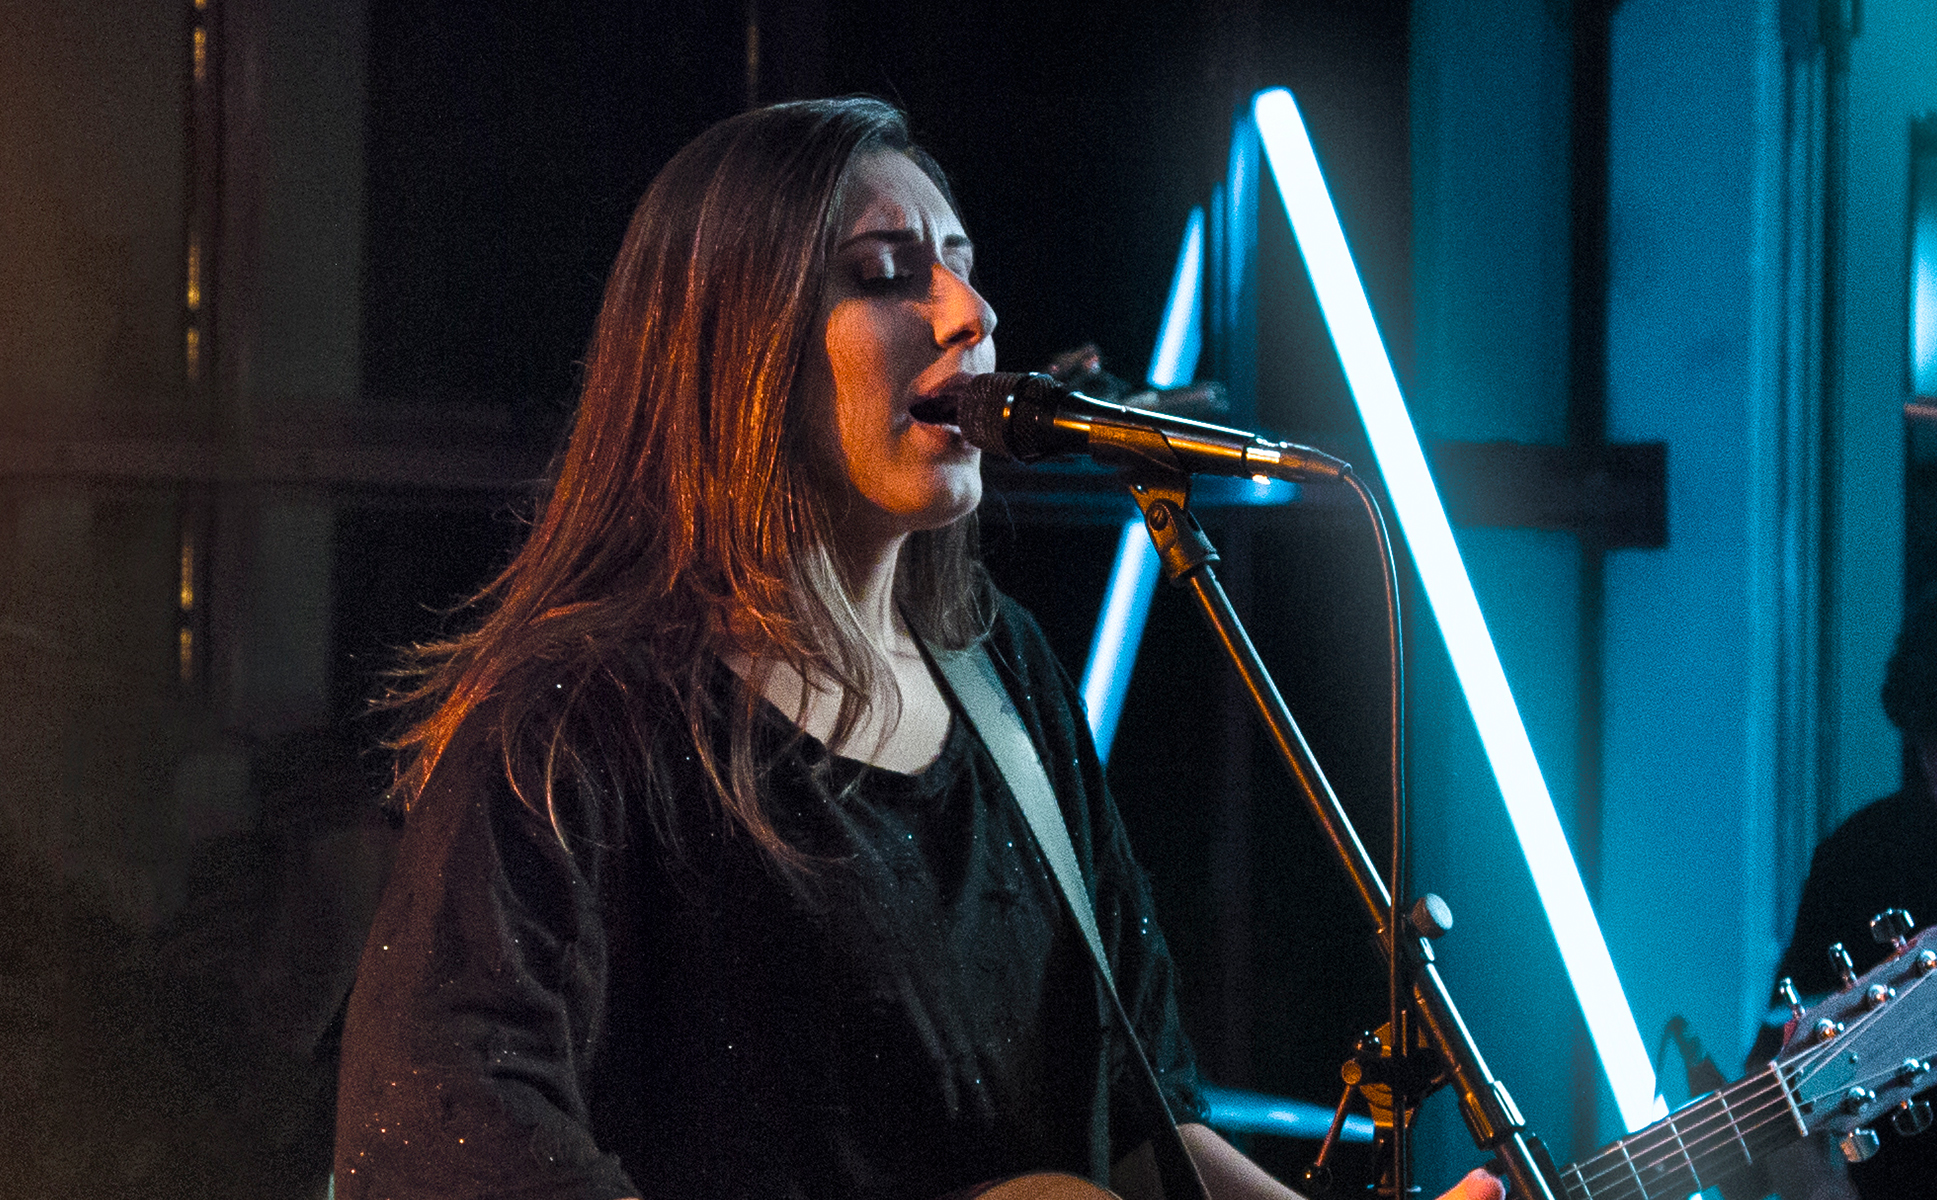 BAIXAR MUSICA ESTOU DE ROBERTO THALLES APAIXONADO